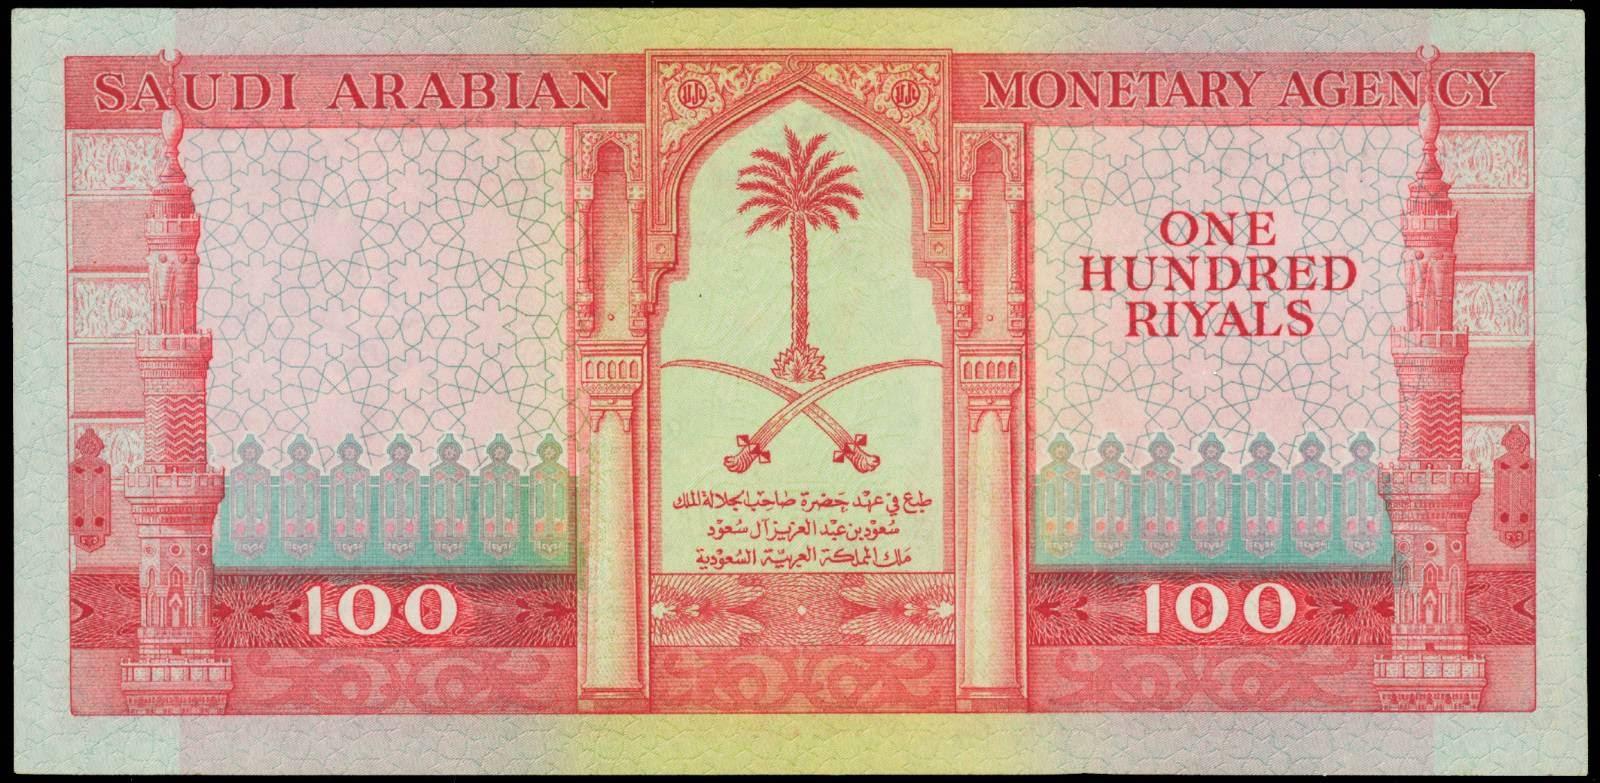 Saudi Arabia money currency One Hundred Riyals Note